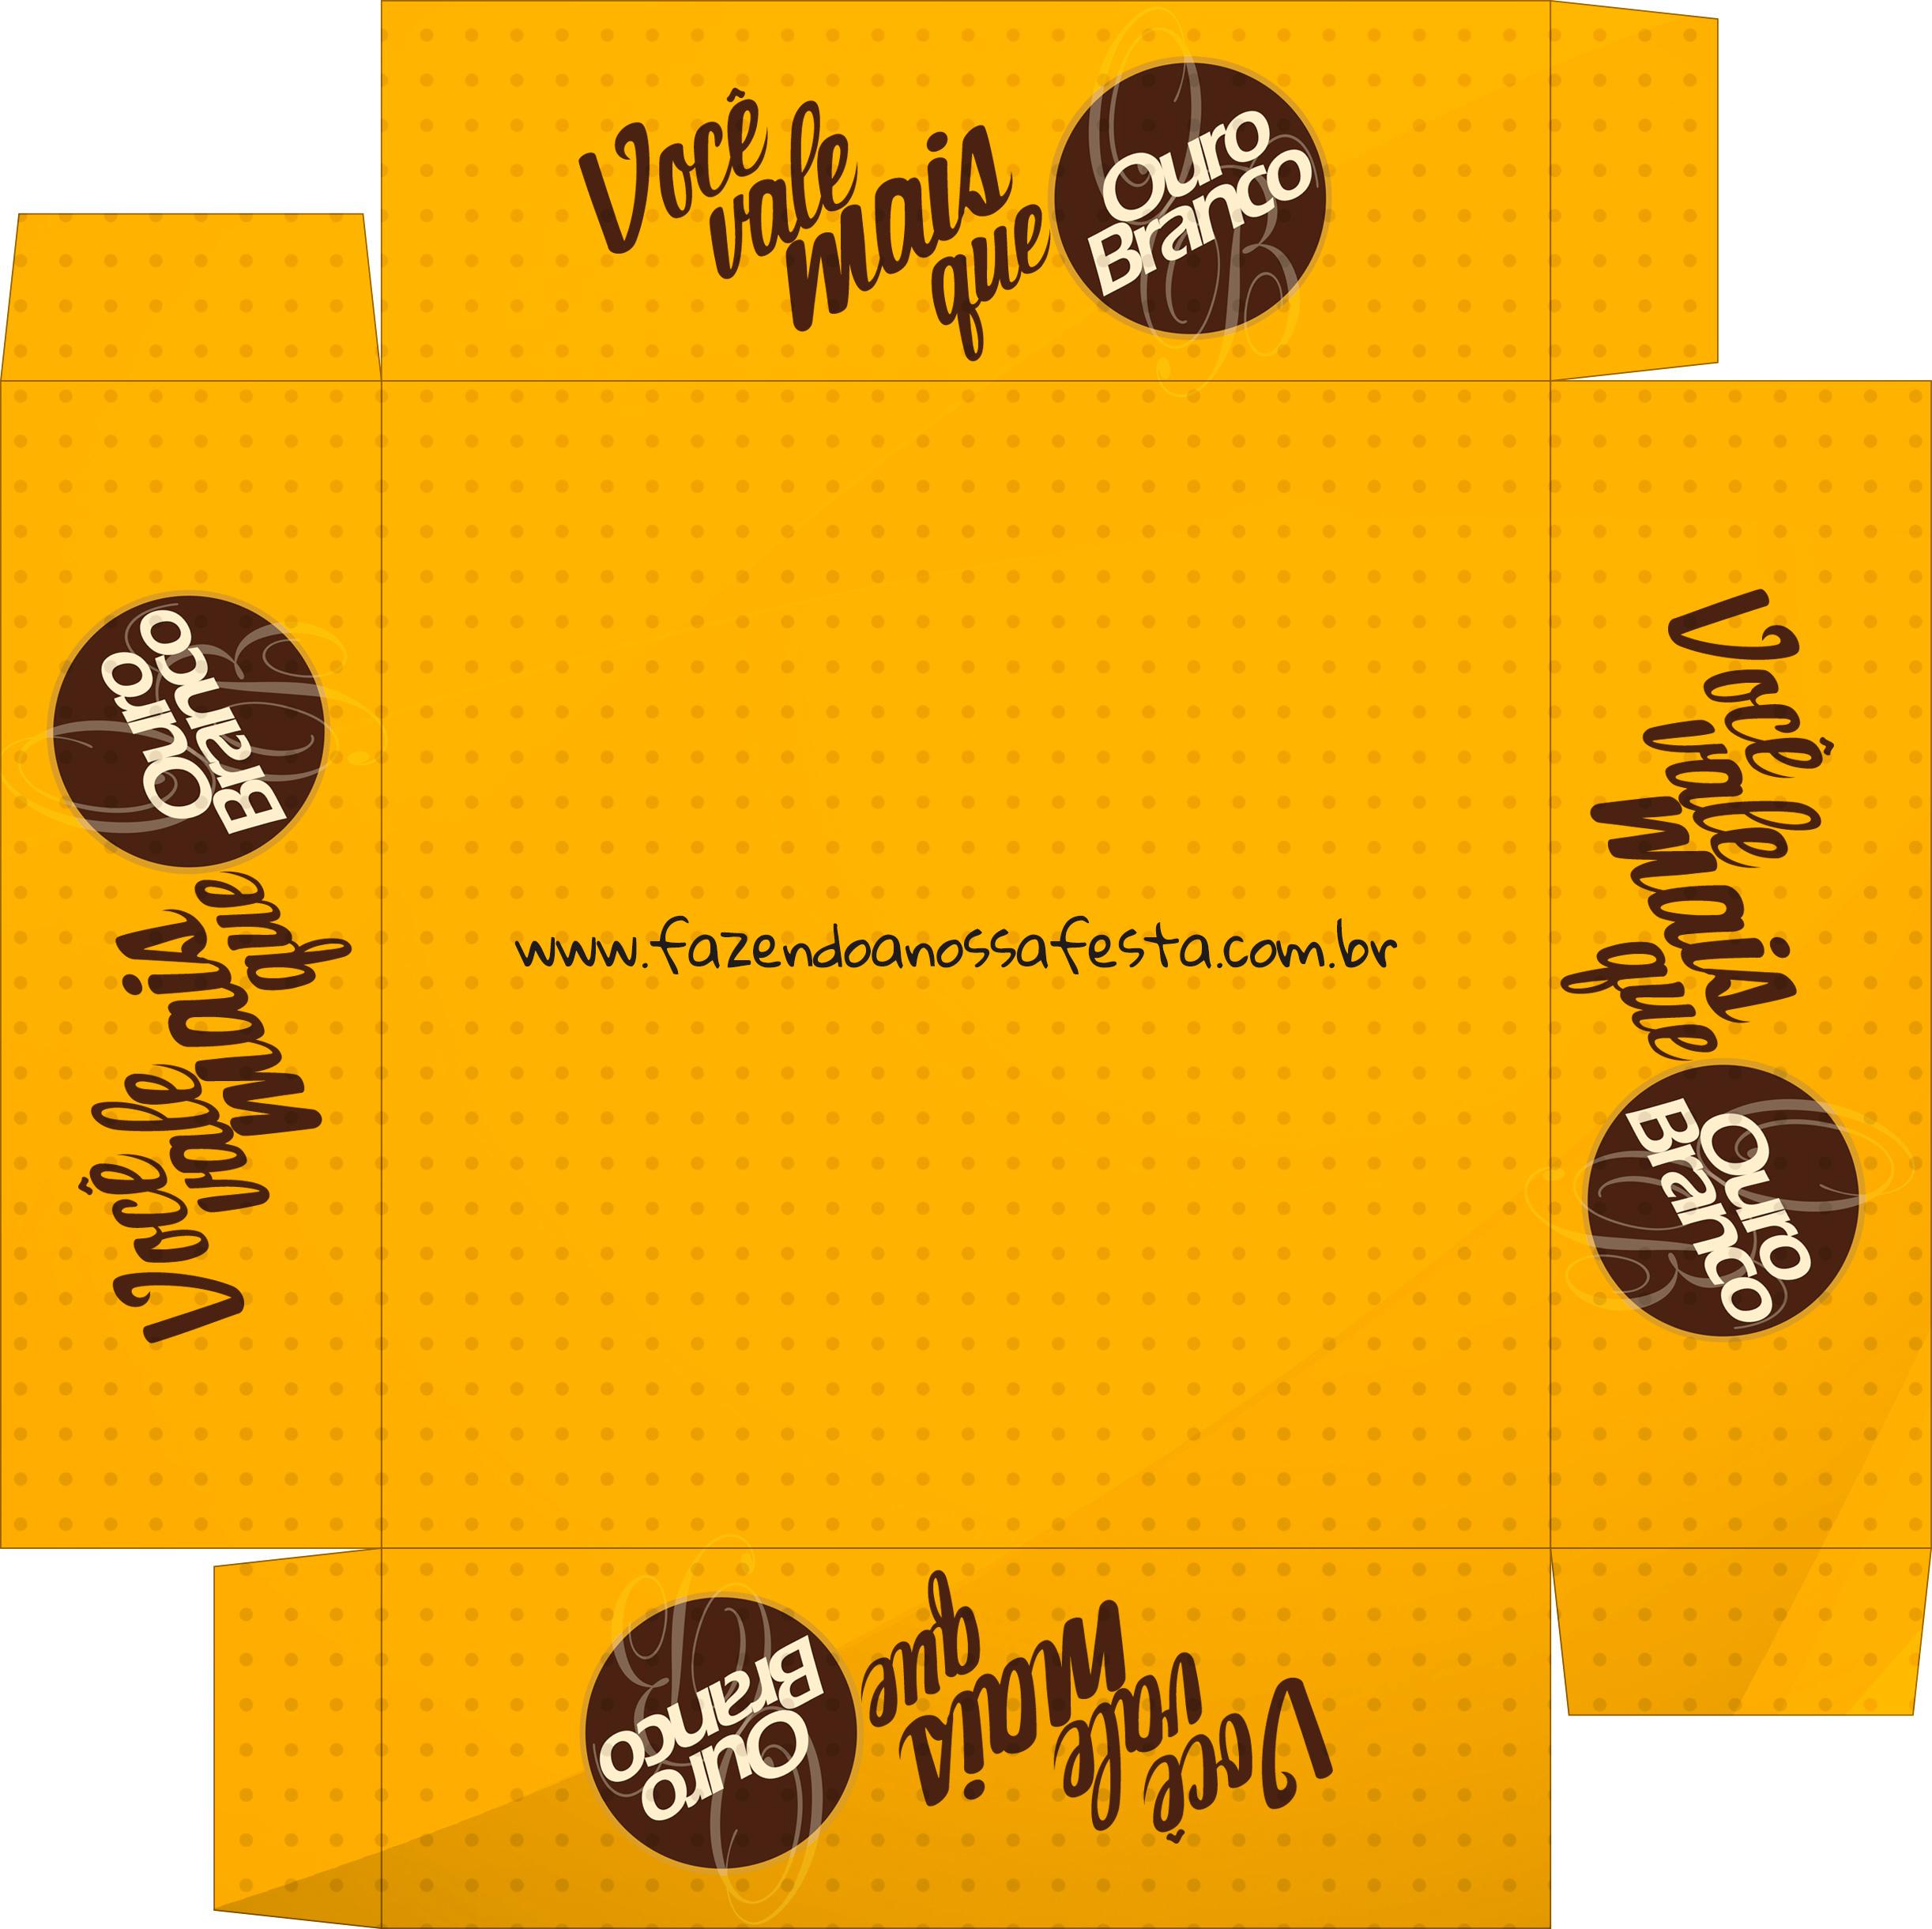 Caixa de Bombom Dia dos Namorados Ouro Branco - Parte de baixo